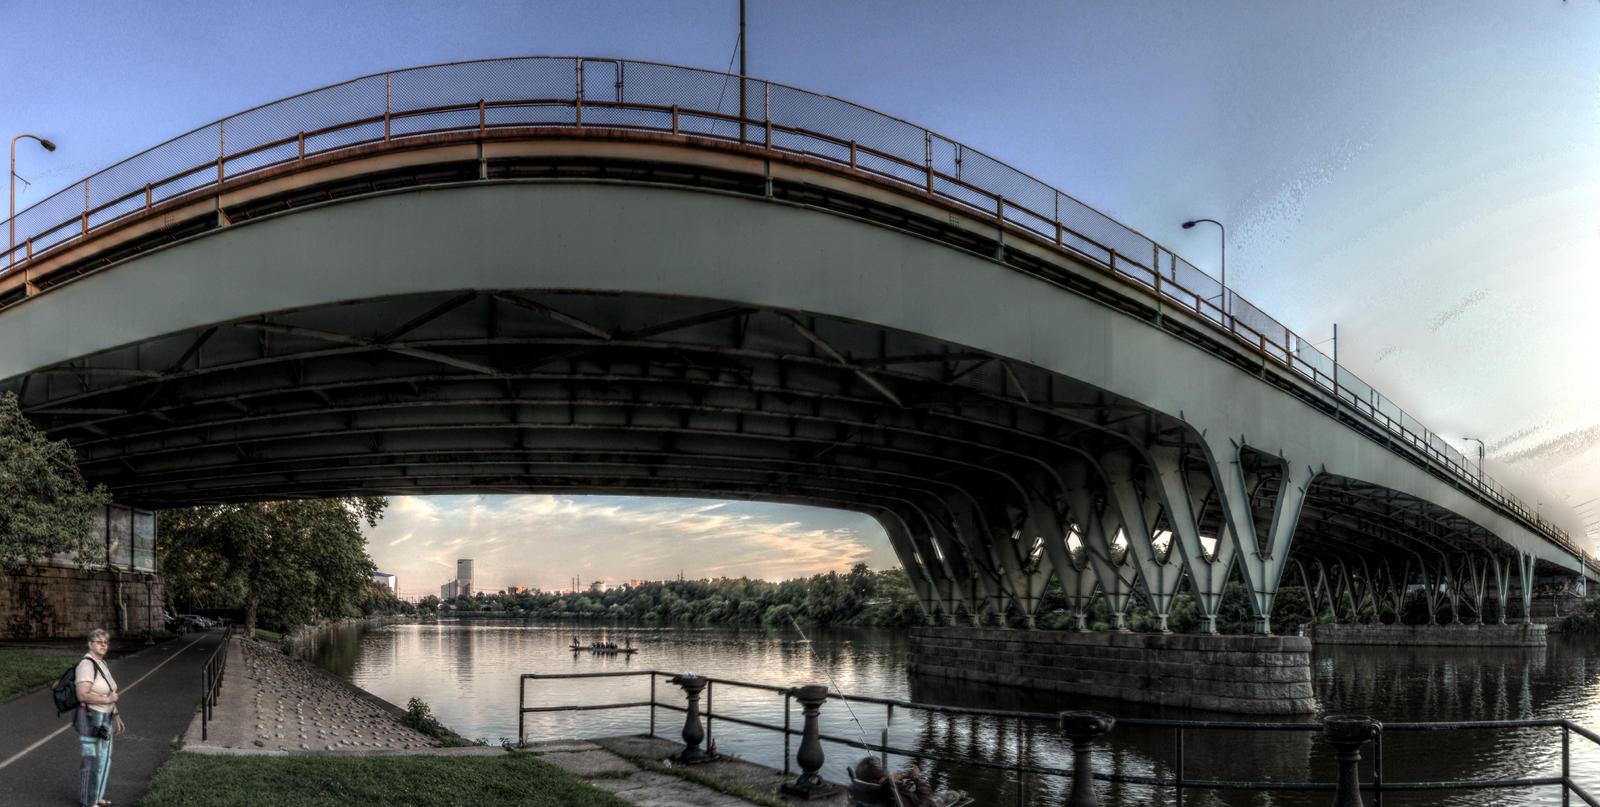 Panorama 3466 hdr pregamma 1 mantiuk06 contrast ma by bruhinb